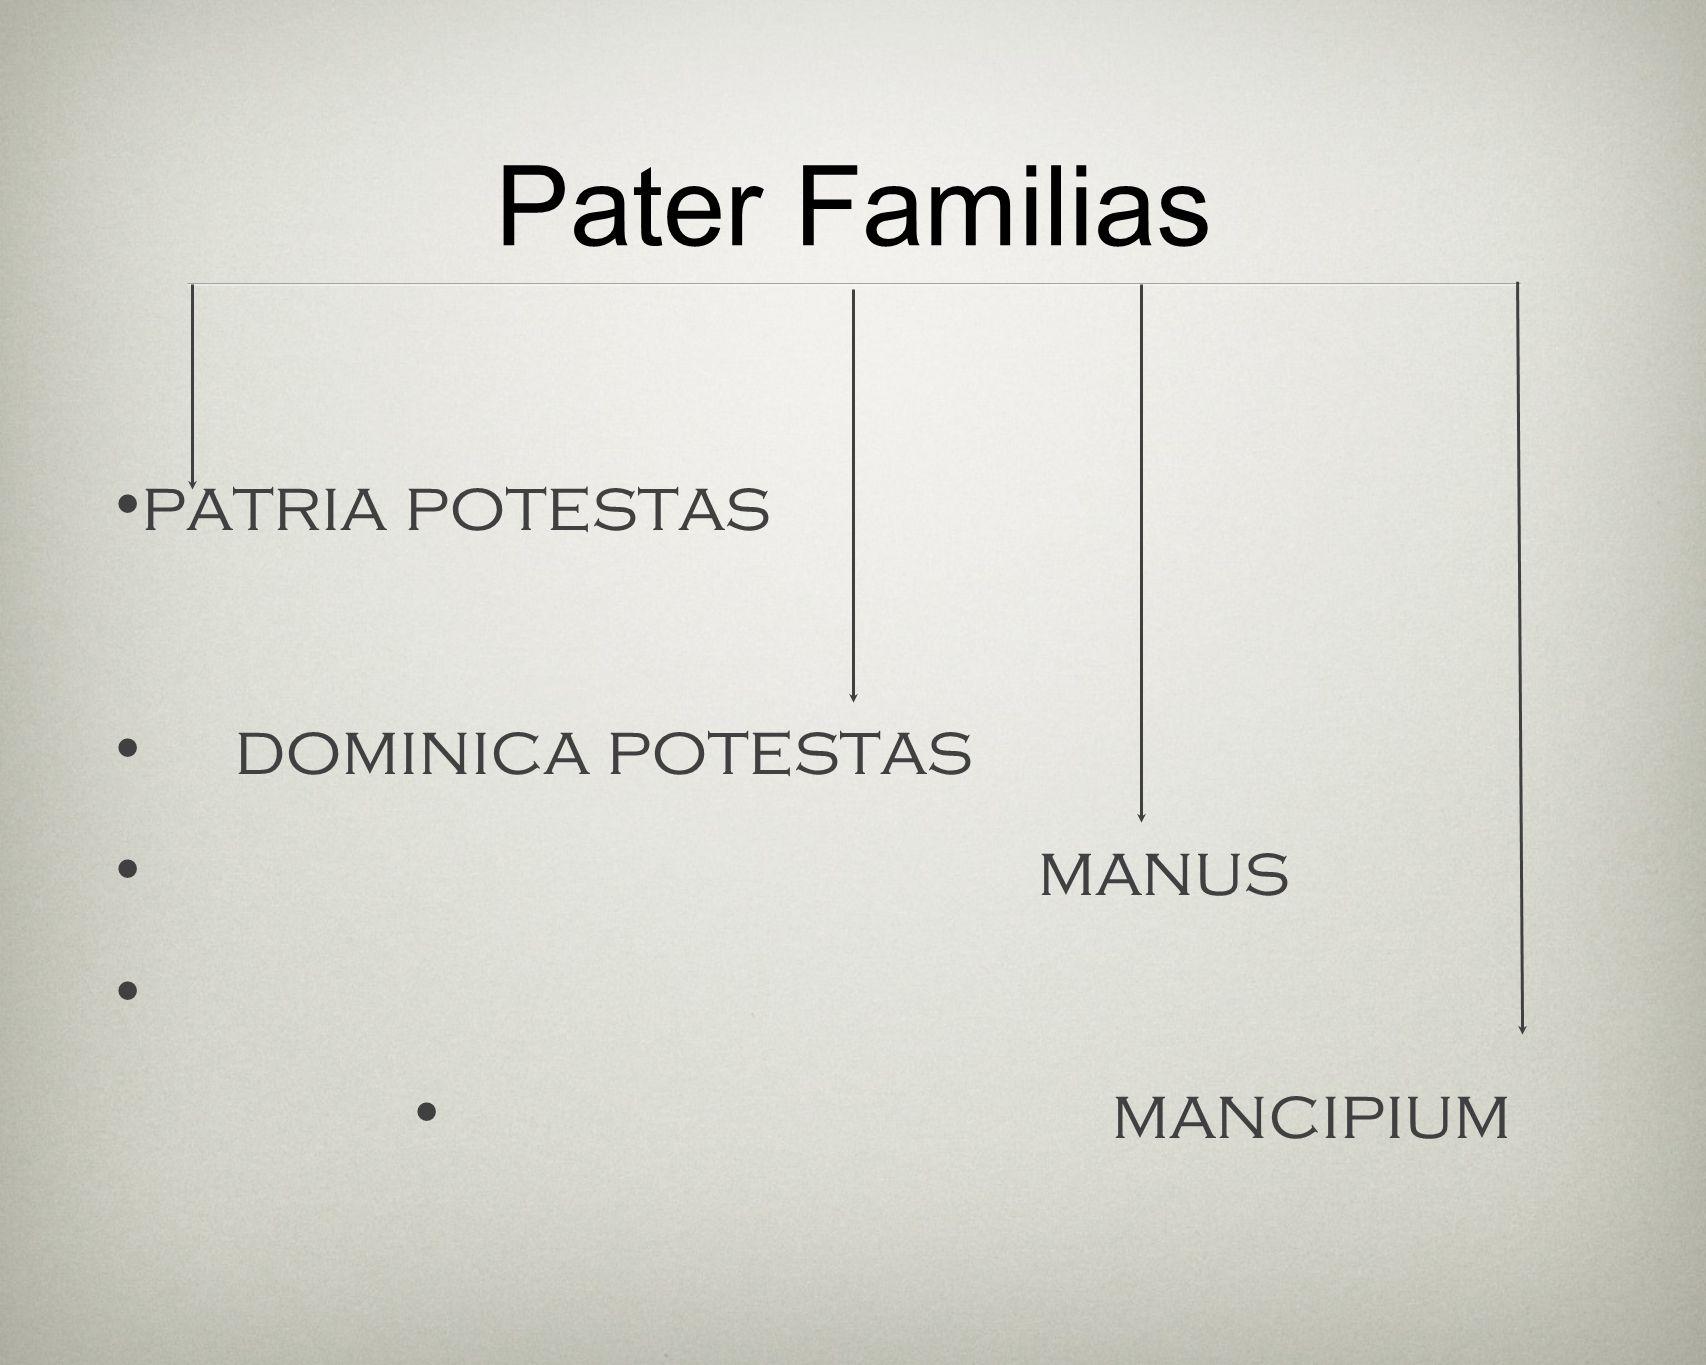 Matka i Aborcja D.47.11.4. Marcianus, Zasady, ks.